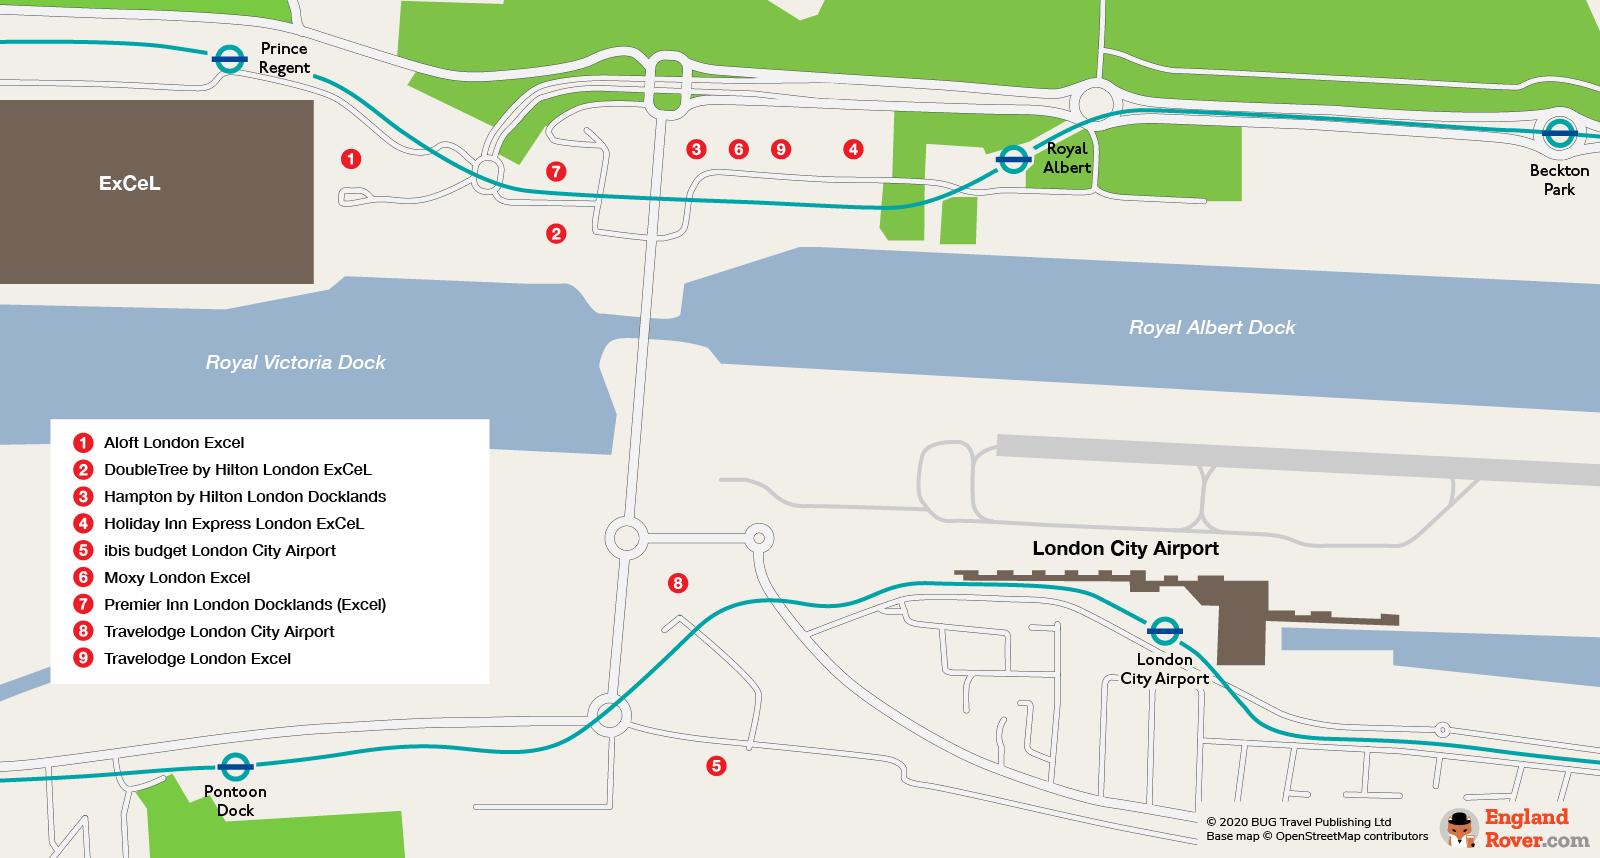 Hotels near London City Airport